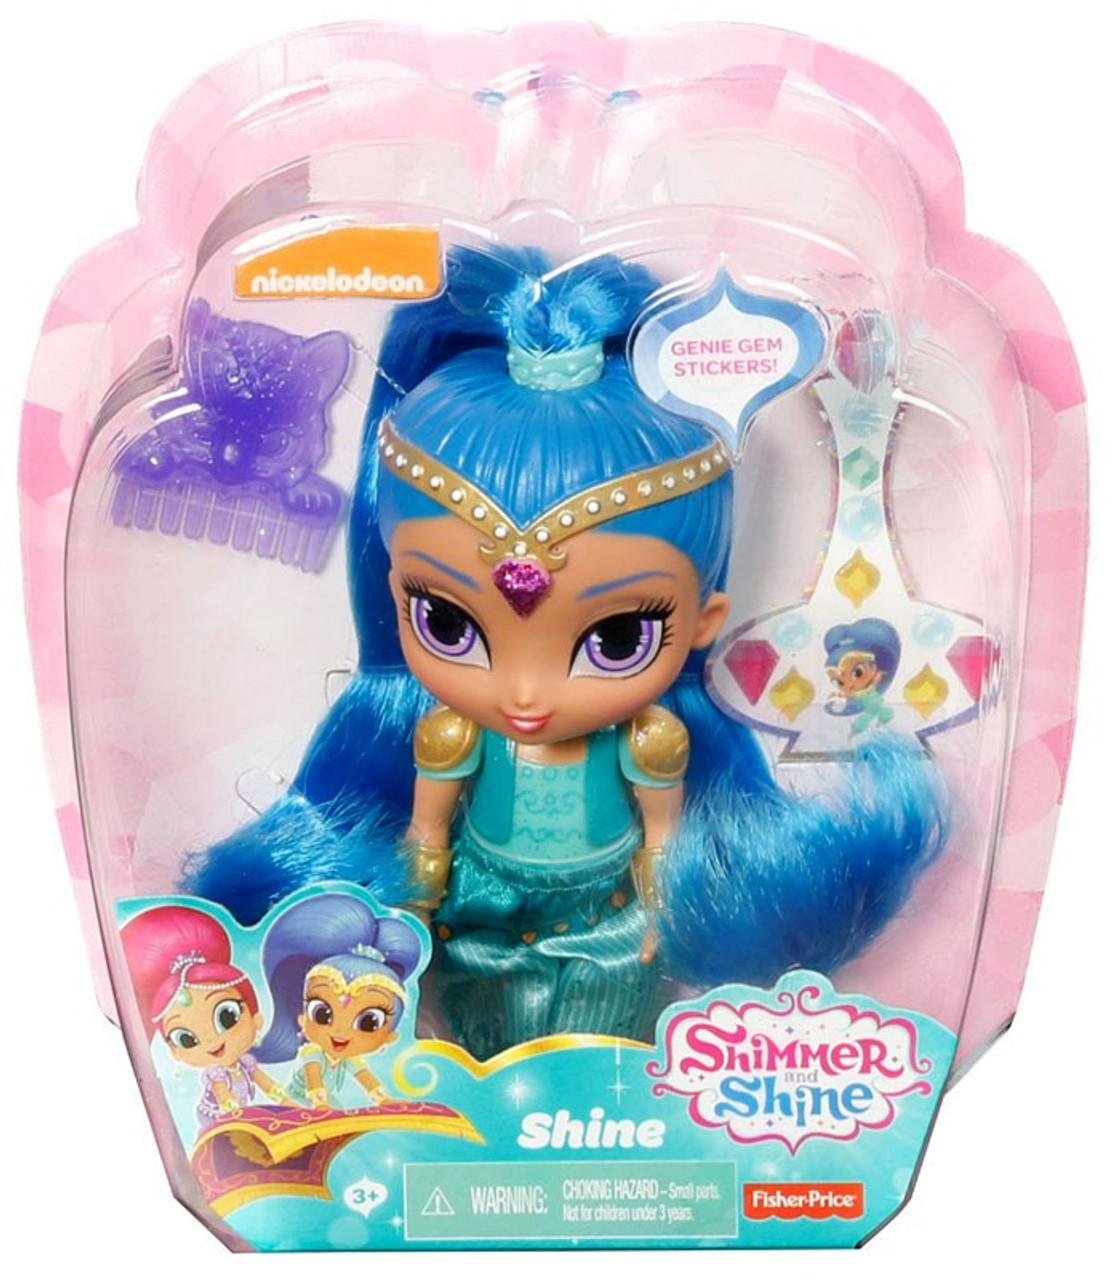 Fisher Price Shimmer & Shine Shine 6-Inch Basic Doll